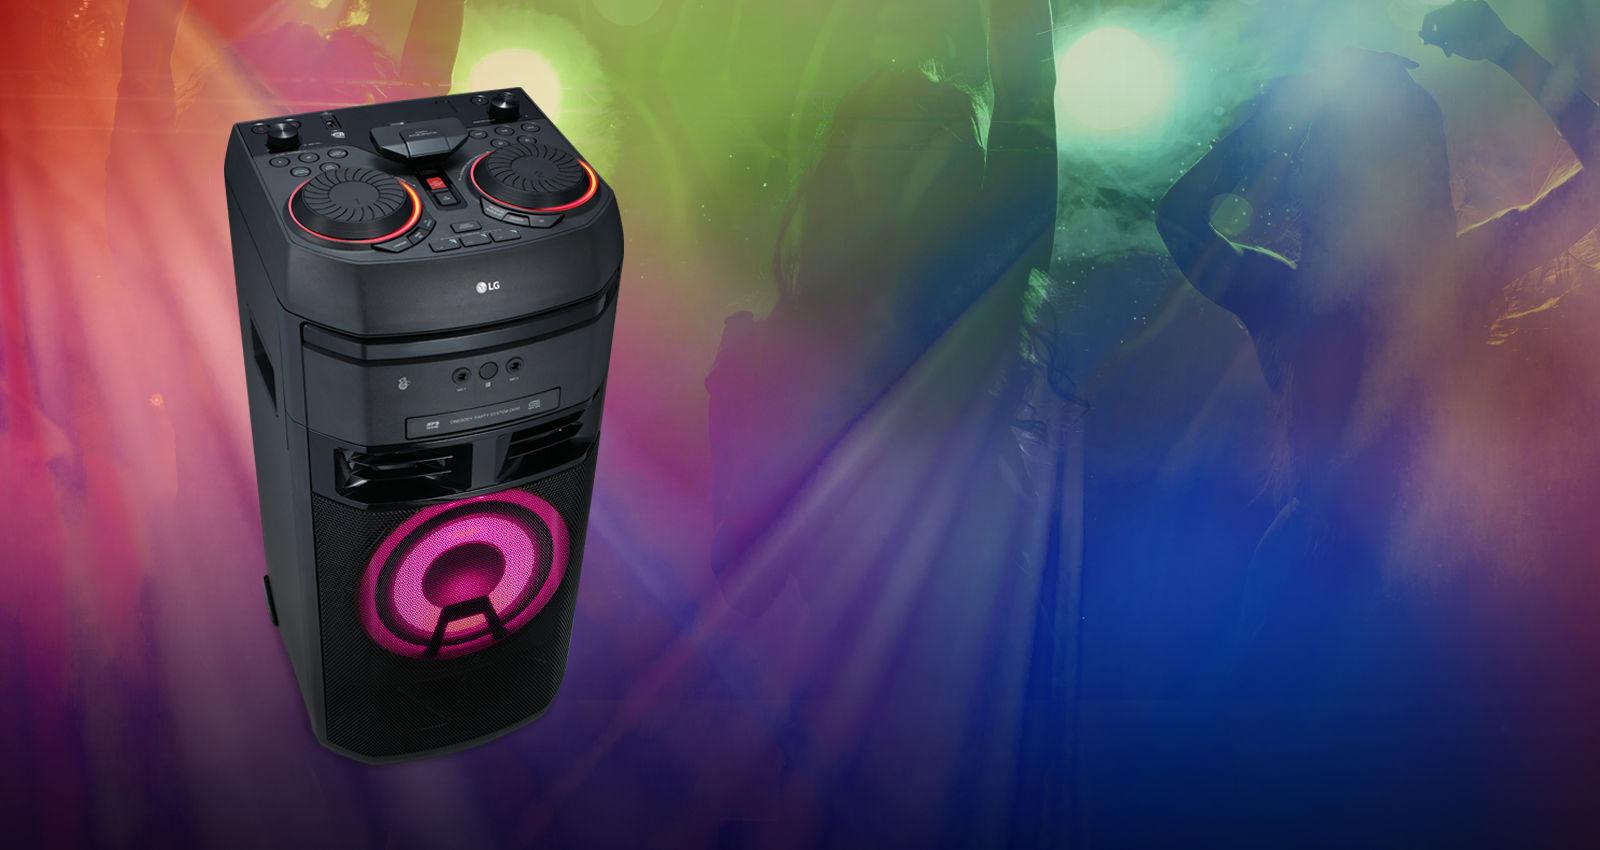 02_OK55_Light_up_your_party_Desktop